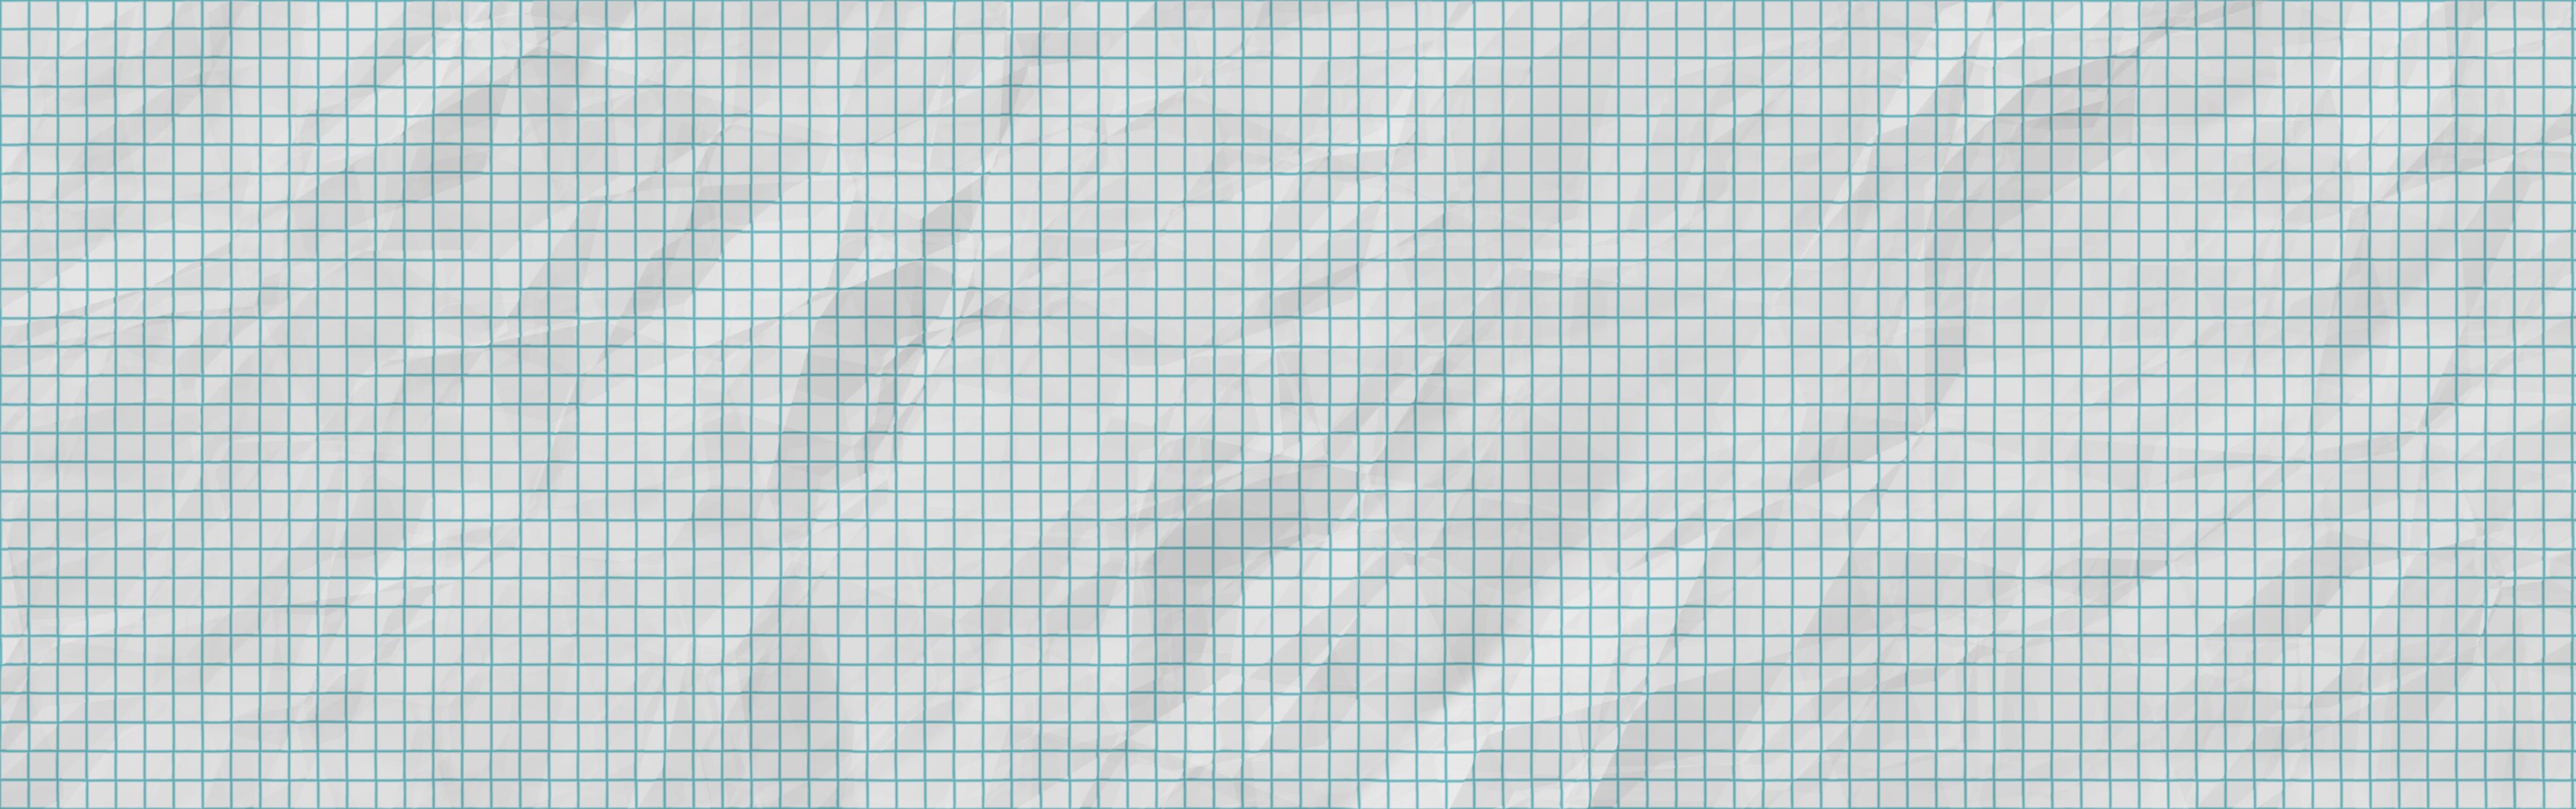 crumpled graph paper - Akba.greenw.co